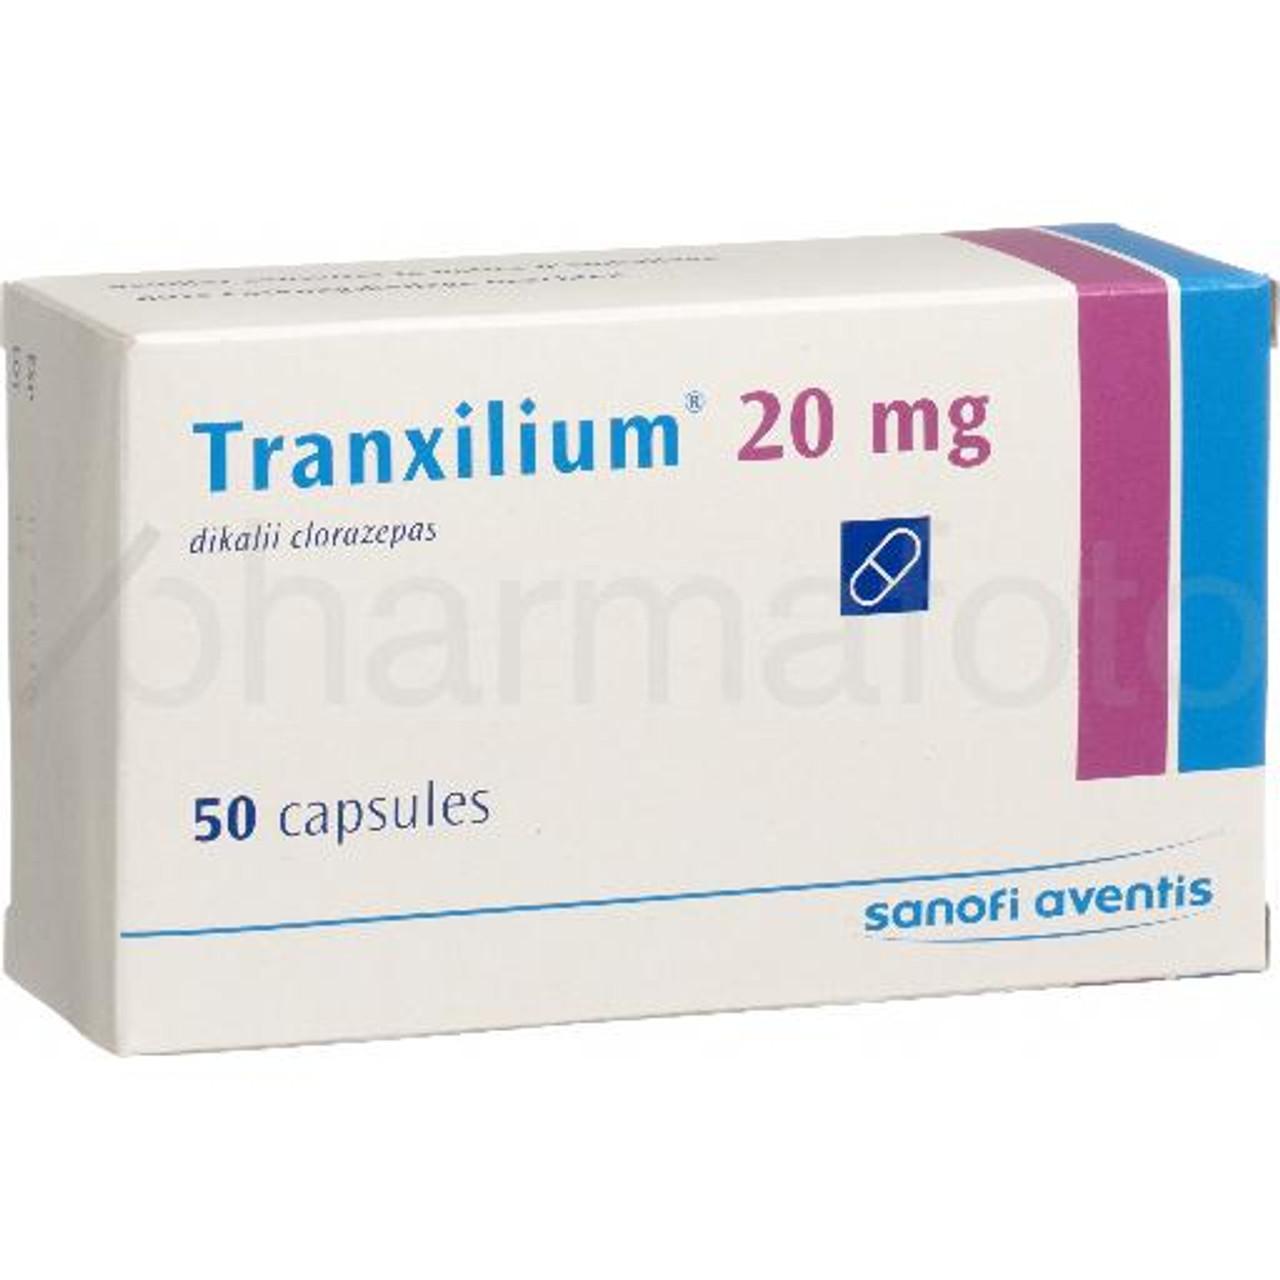 Tranxilium Caps 20 Mg 50 Pce Pharmafoto